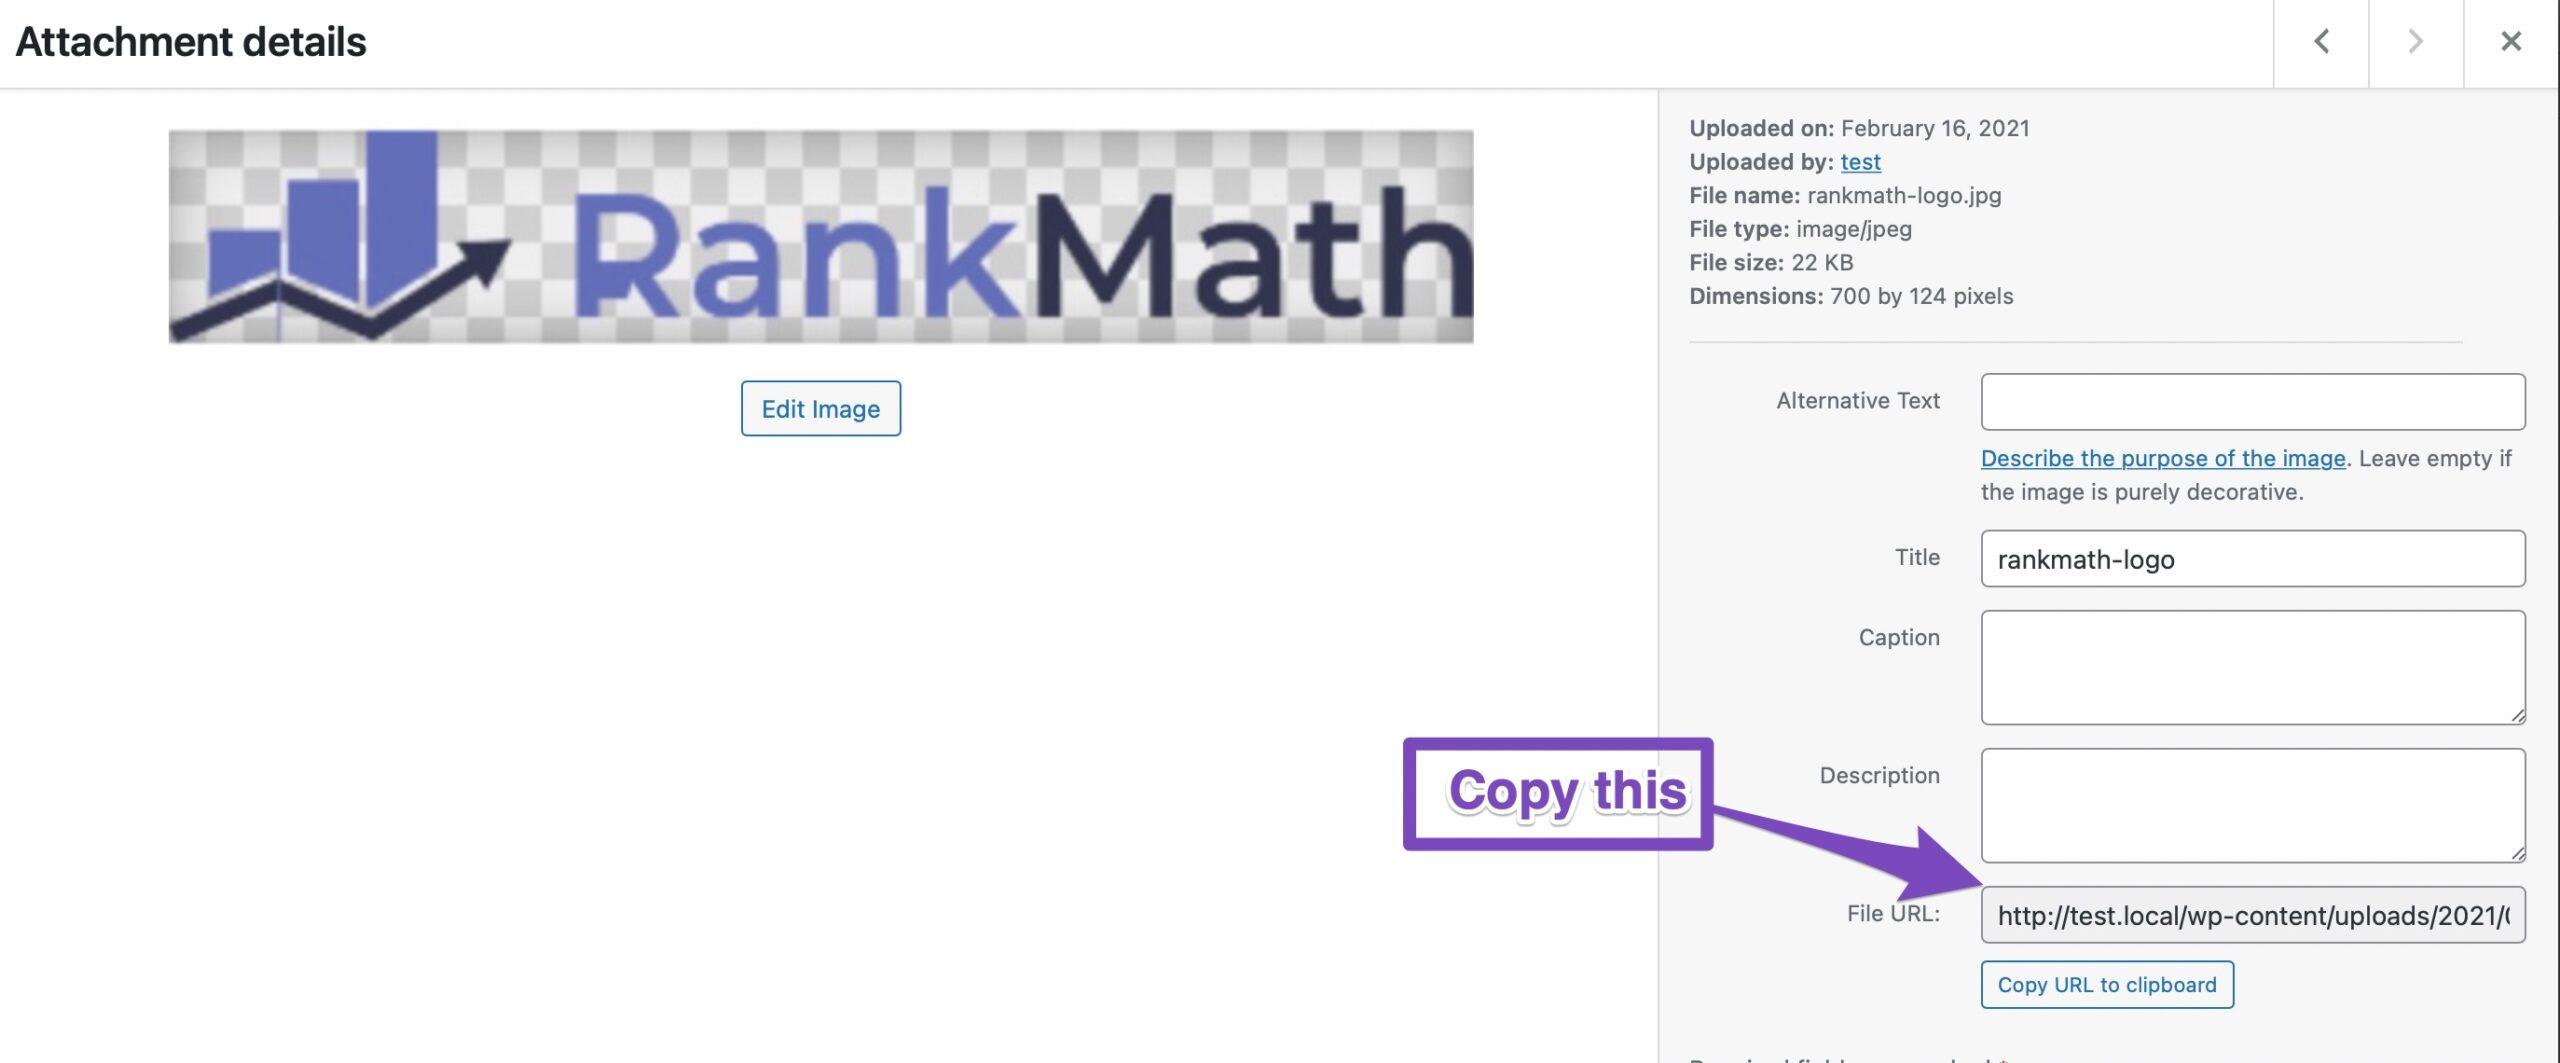 copy URL of uploaded organization logo